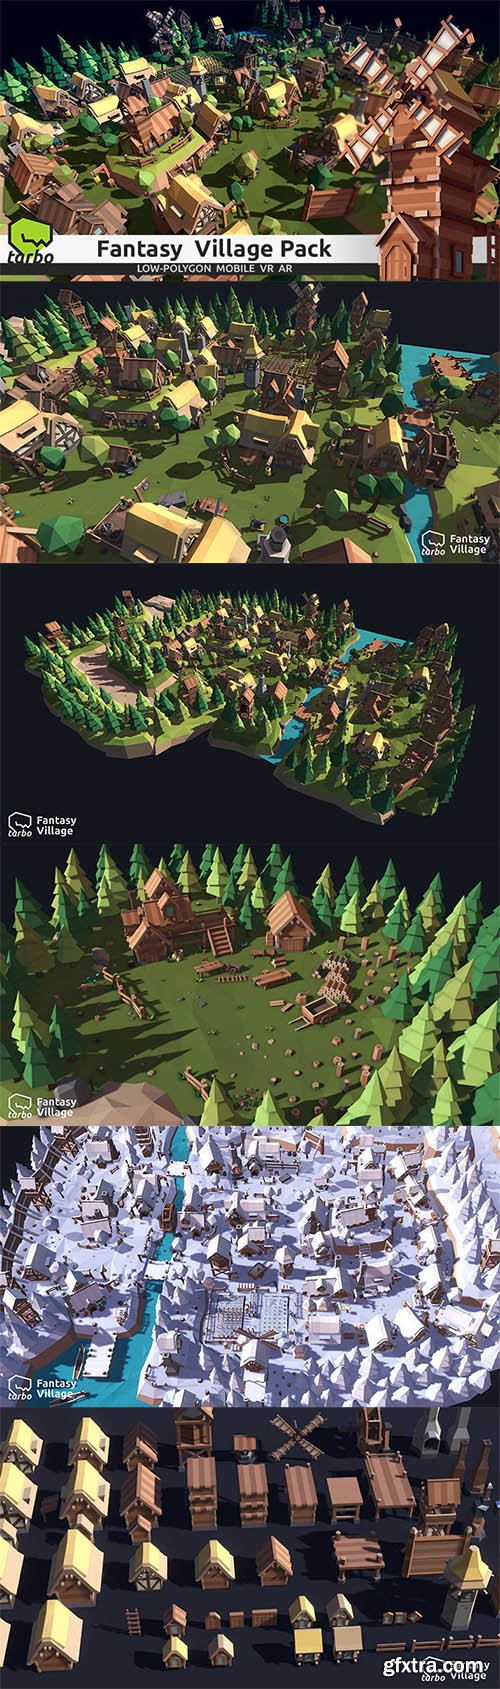 Cgtrader - TARBO - Lowpoly Fantasy Village Pack